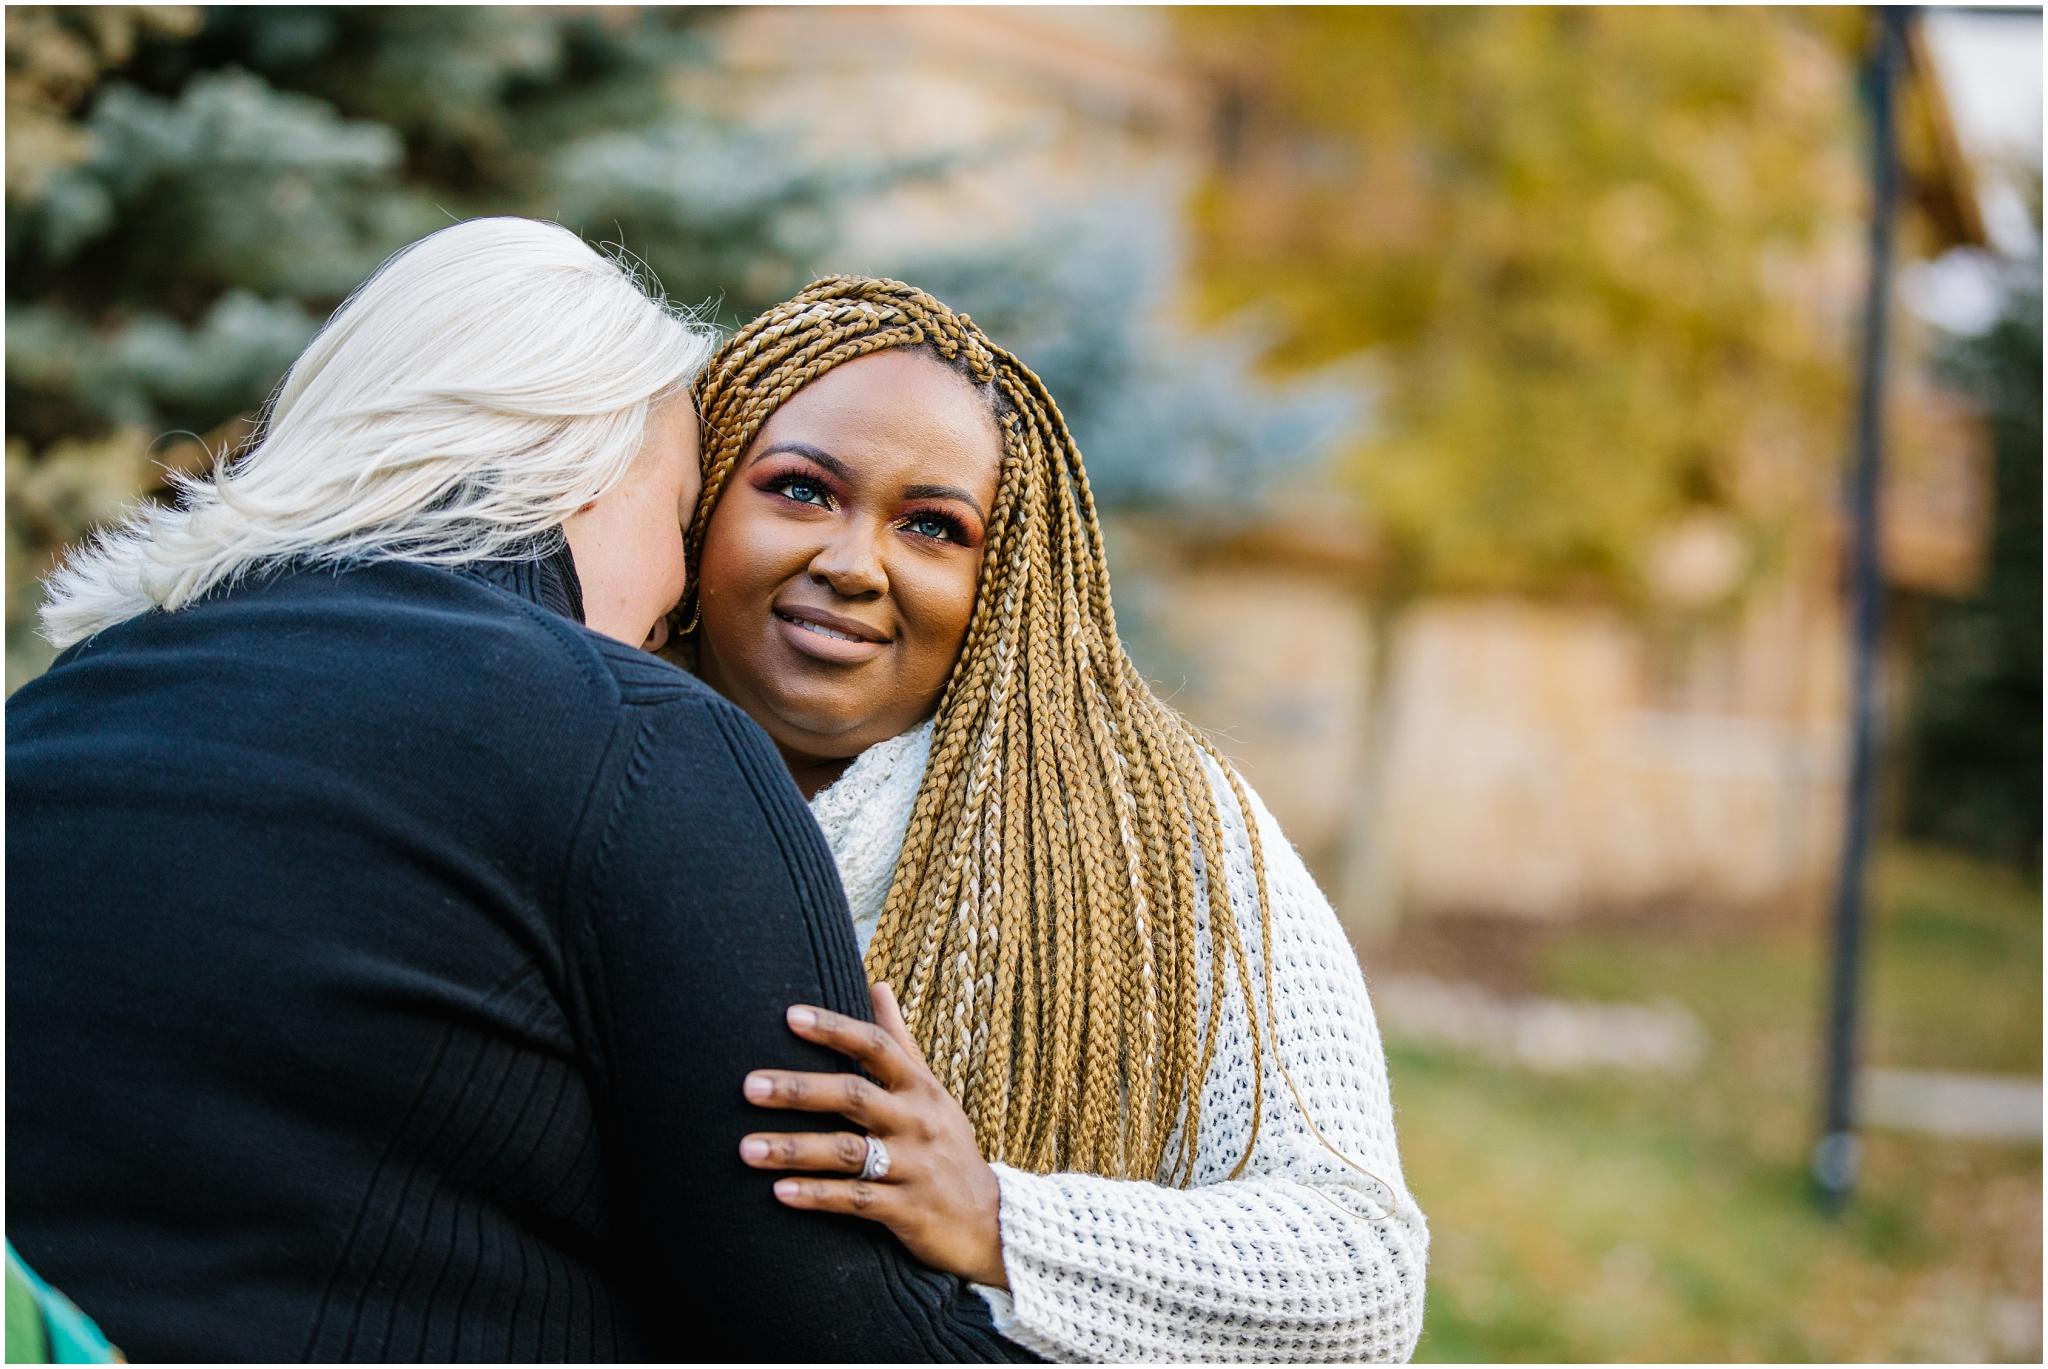 LisaTiffany2018-40_Lizzie-B-Imagery-Utah-Family-Photographer-Salt-Lake-City-Park-City-Miners-Hospital-Community-Center.jpg